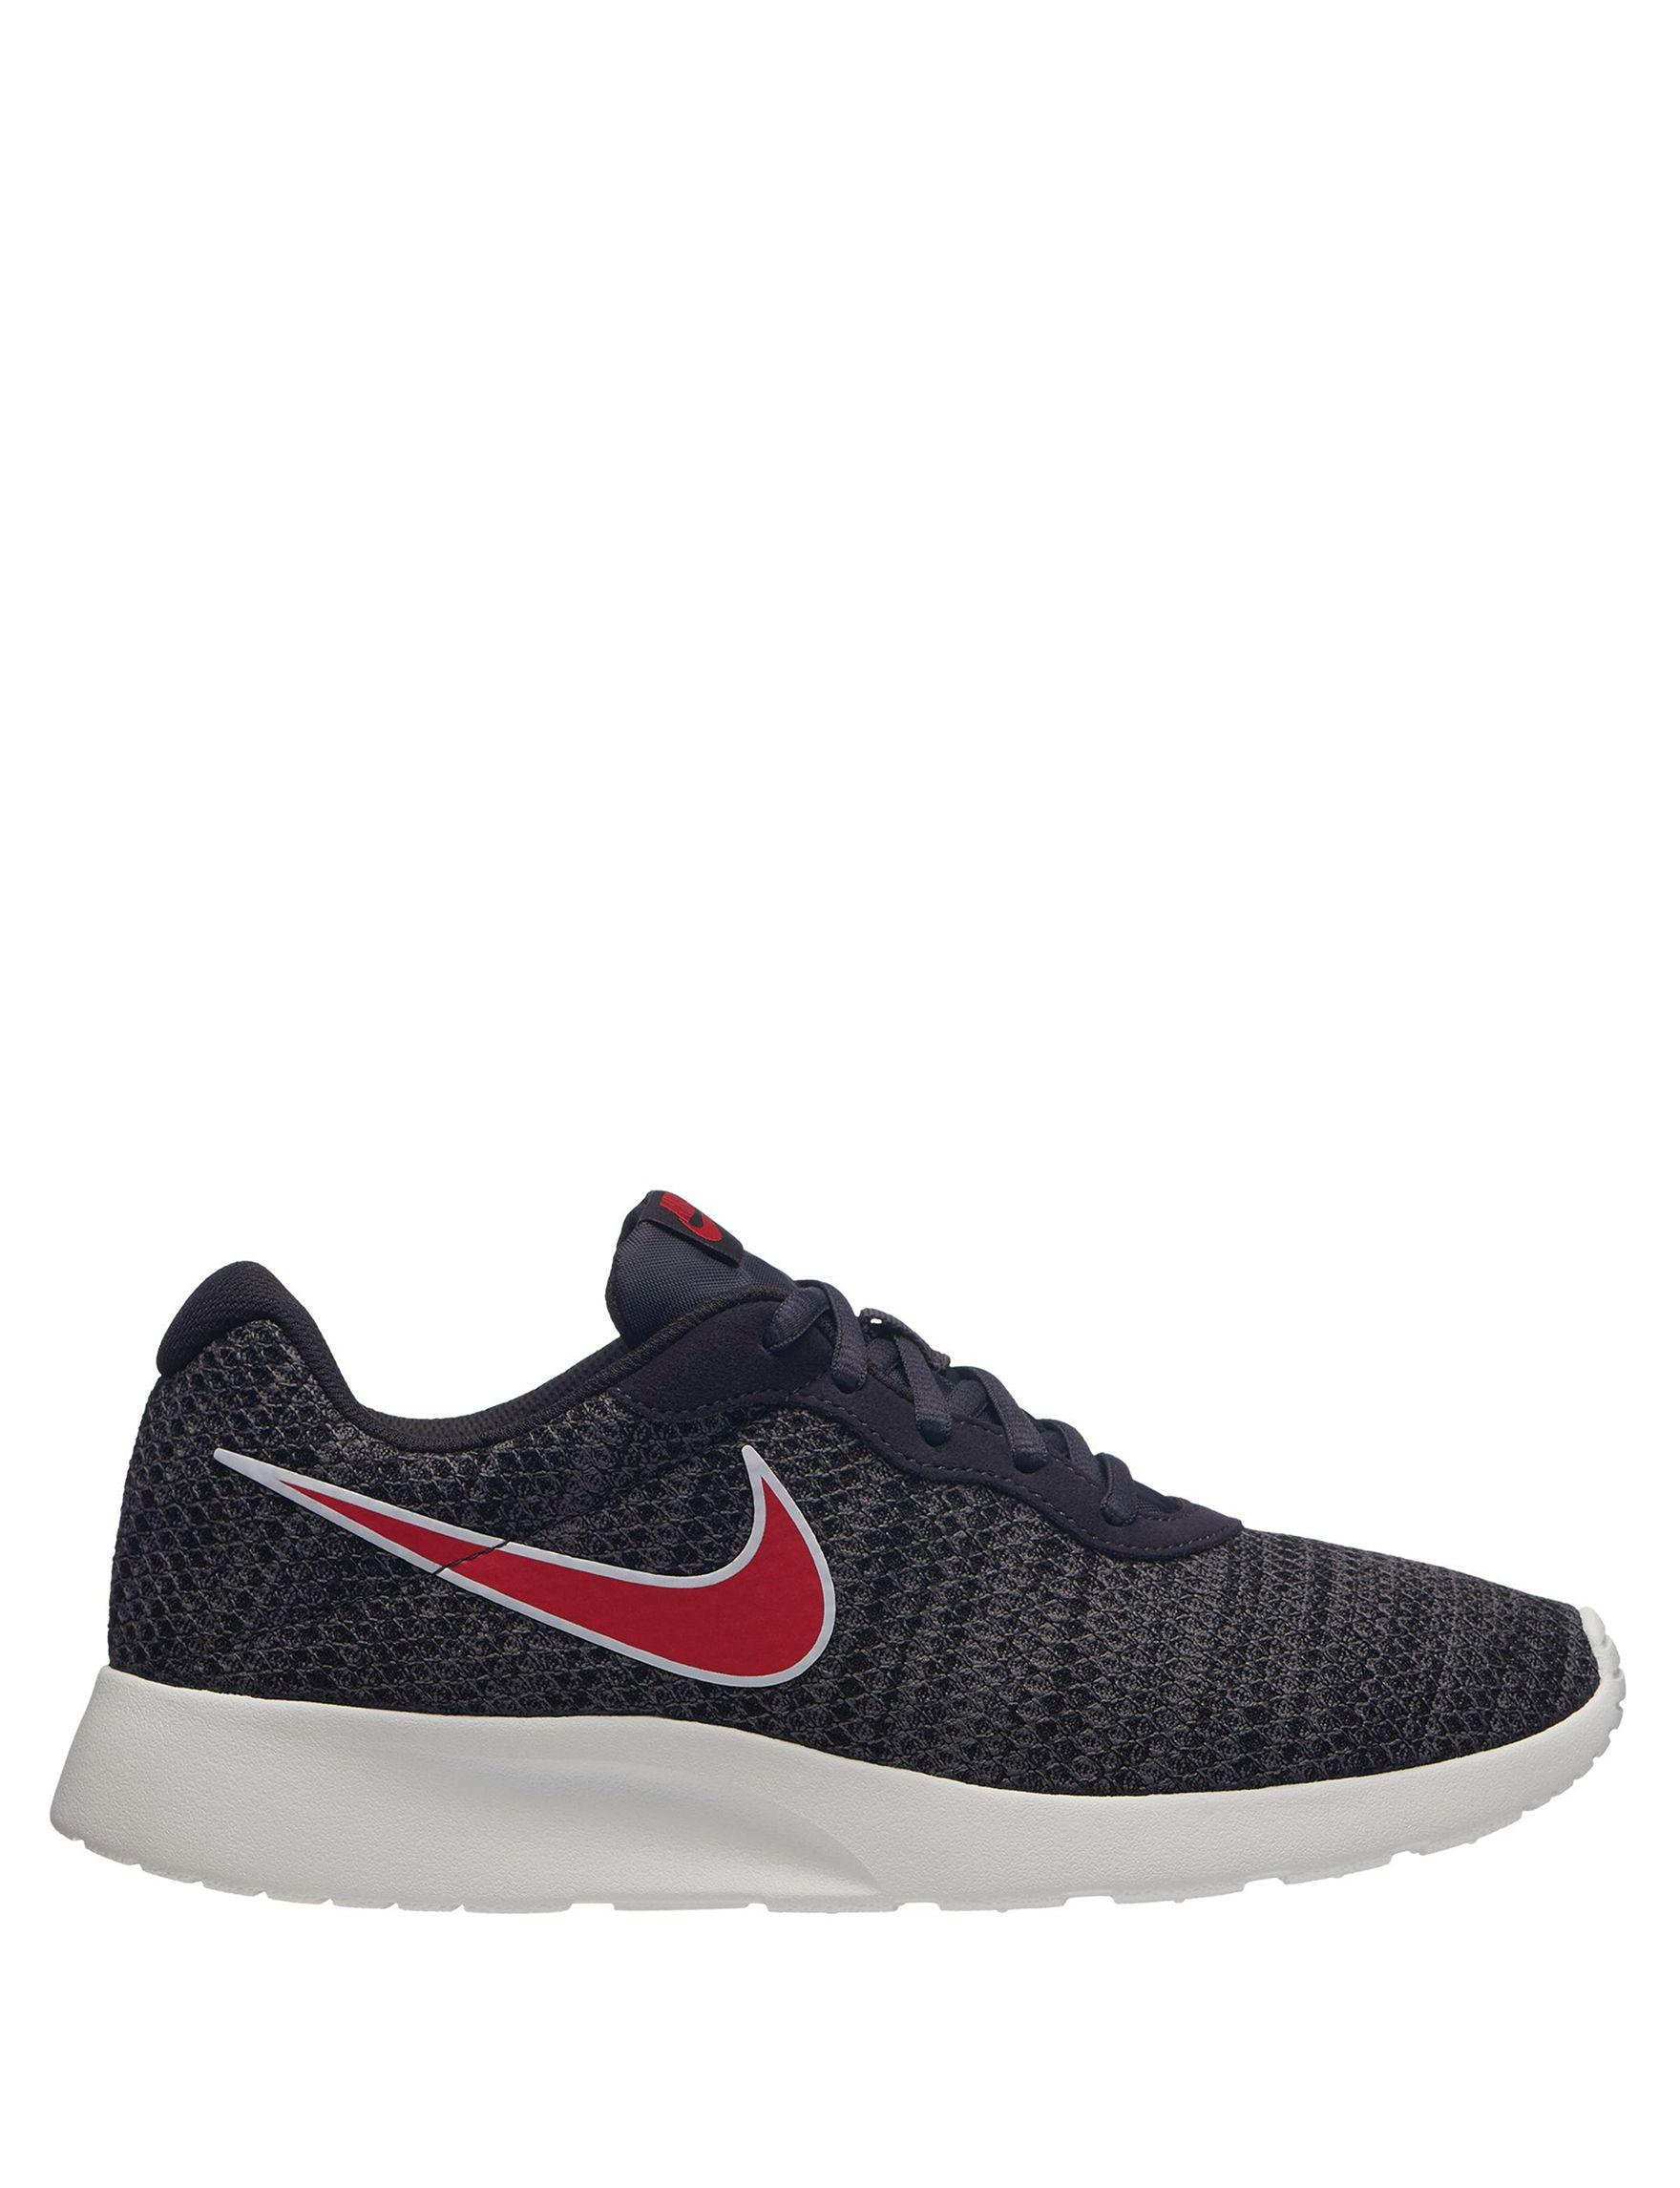 Nike Black / Red